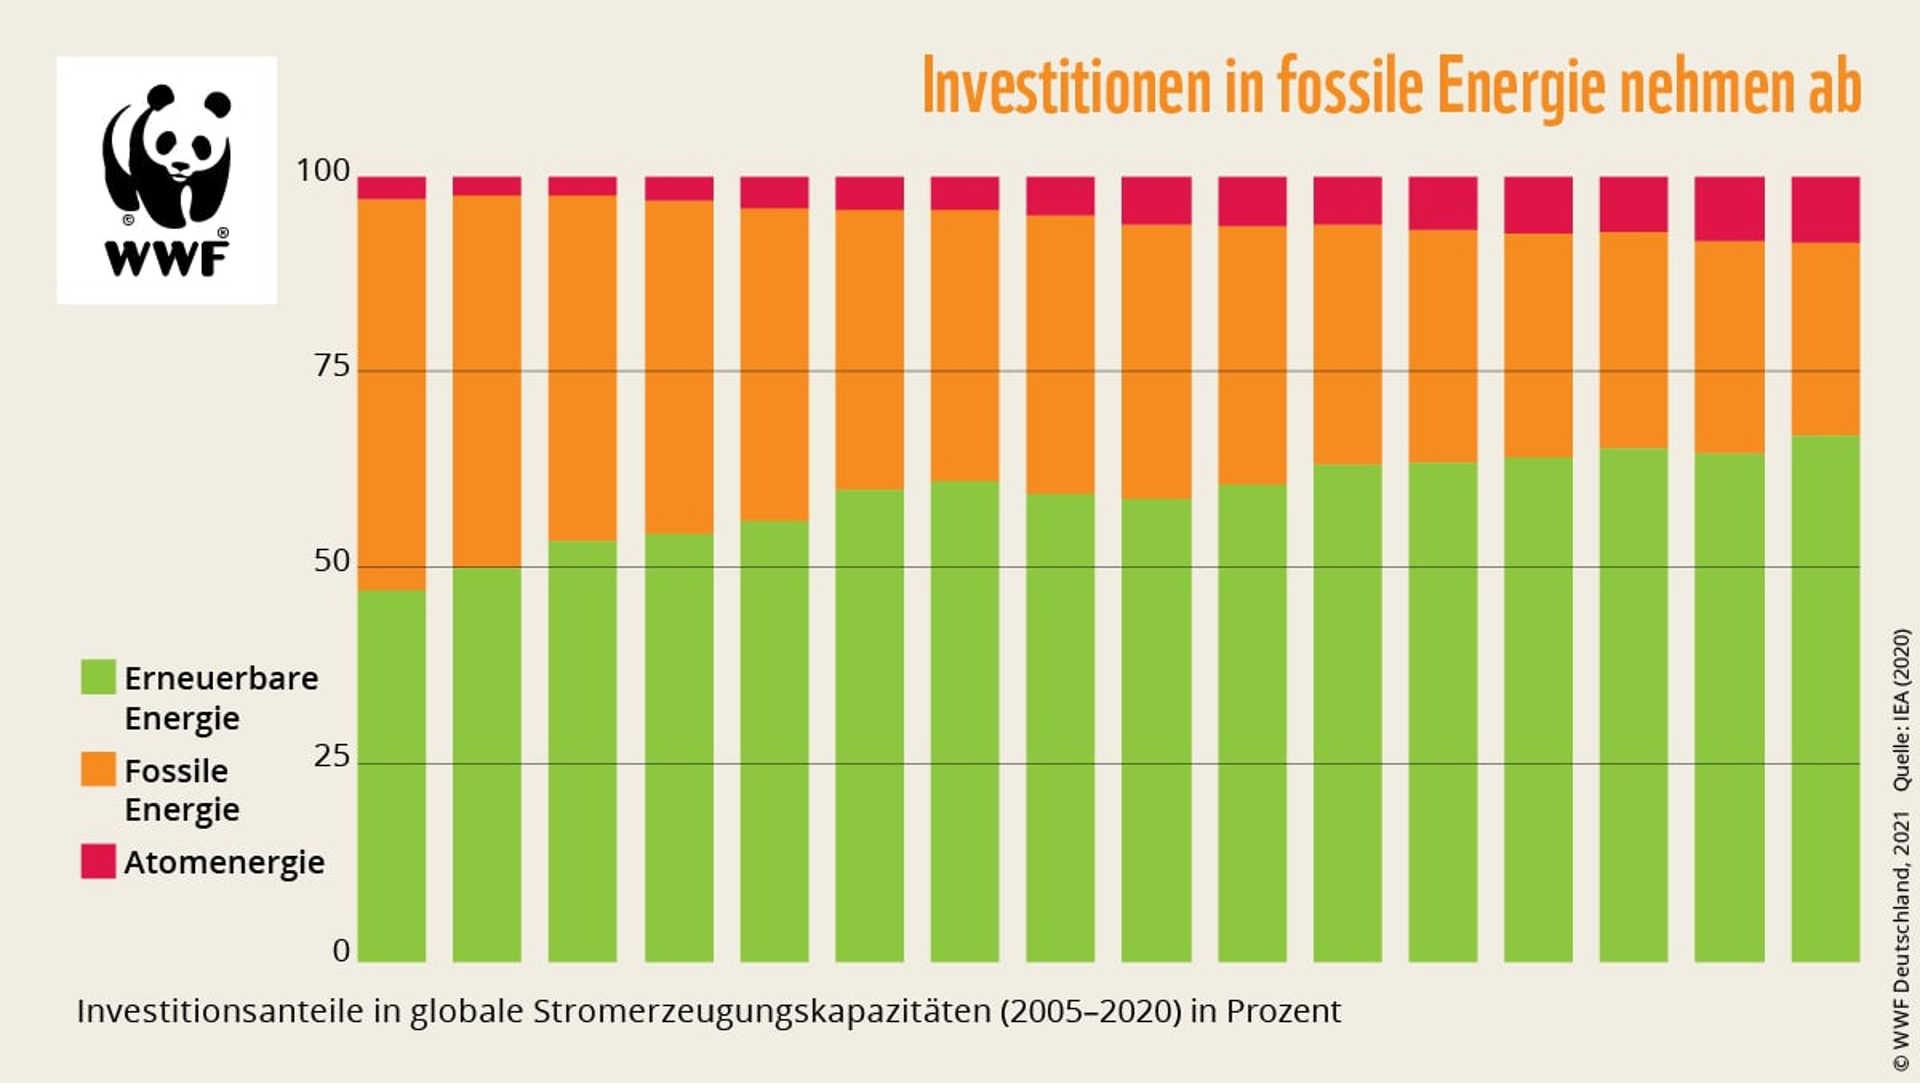 WWF Grafik Sinkende Investitionen in fossile Energie